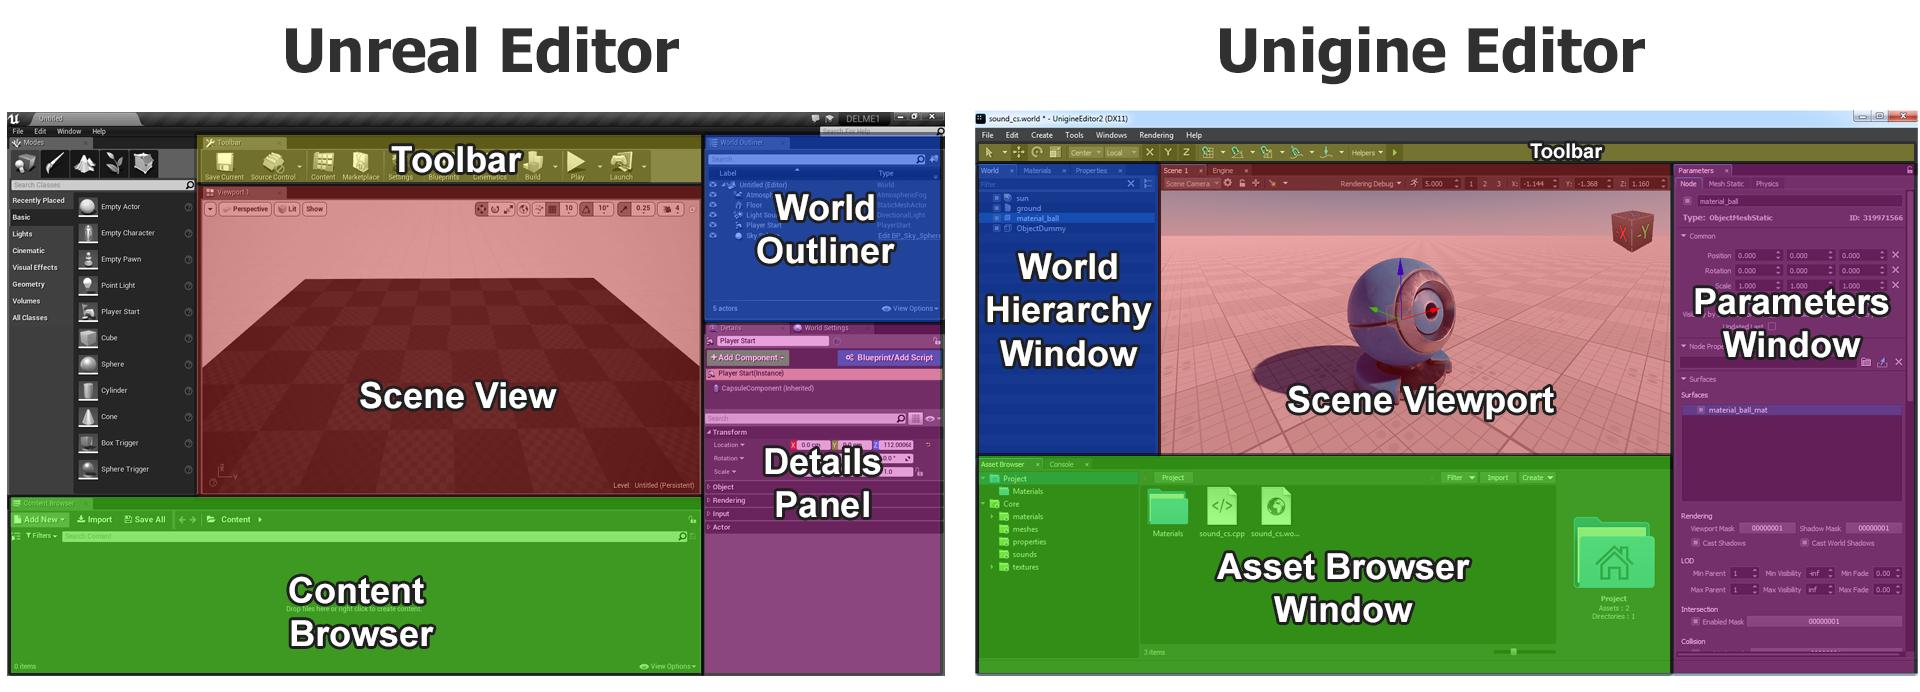 Migrating to Unigine from Unreal Engine - Documentation